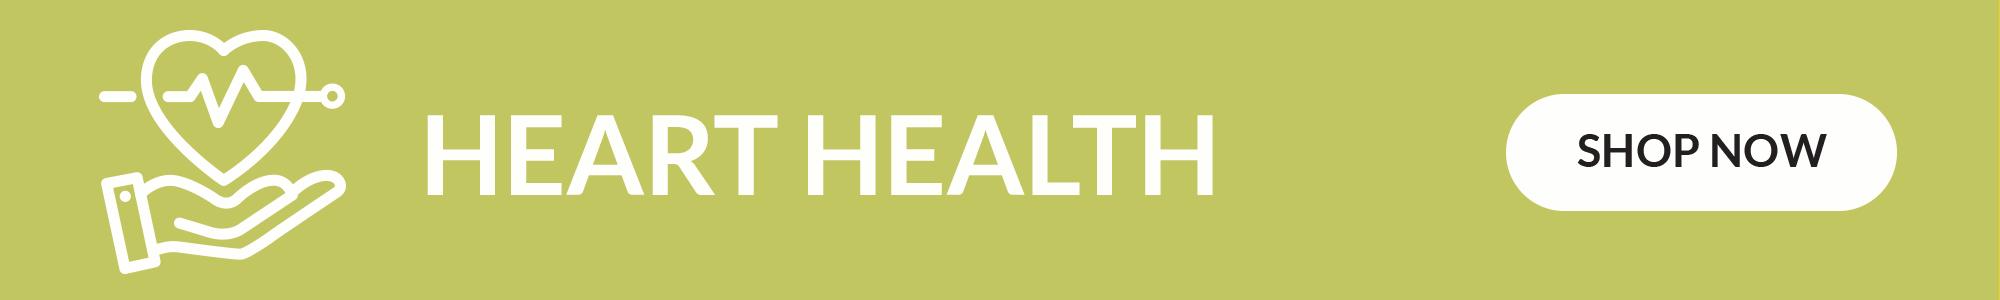 heart-health-header.png